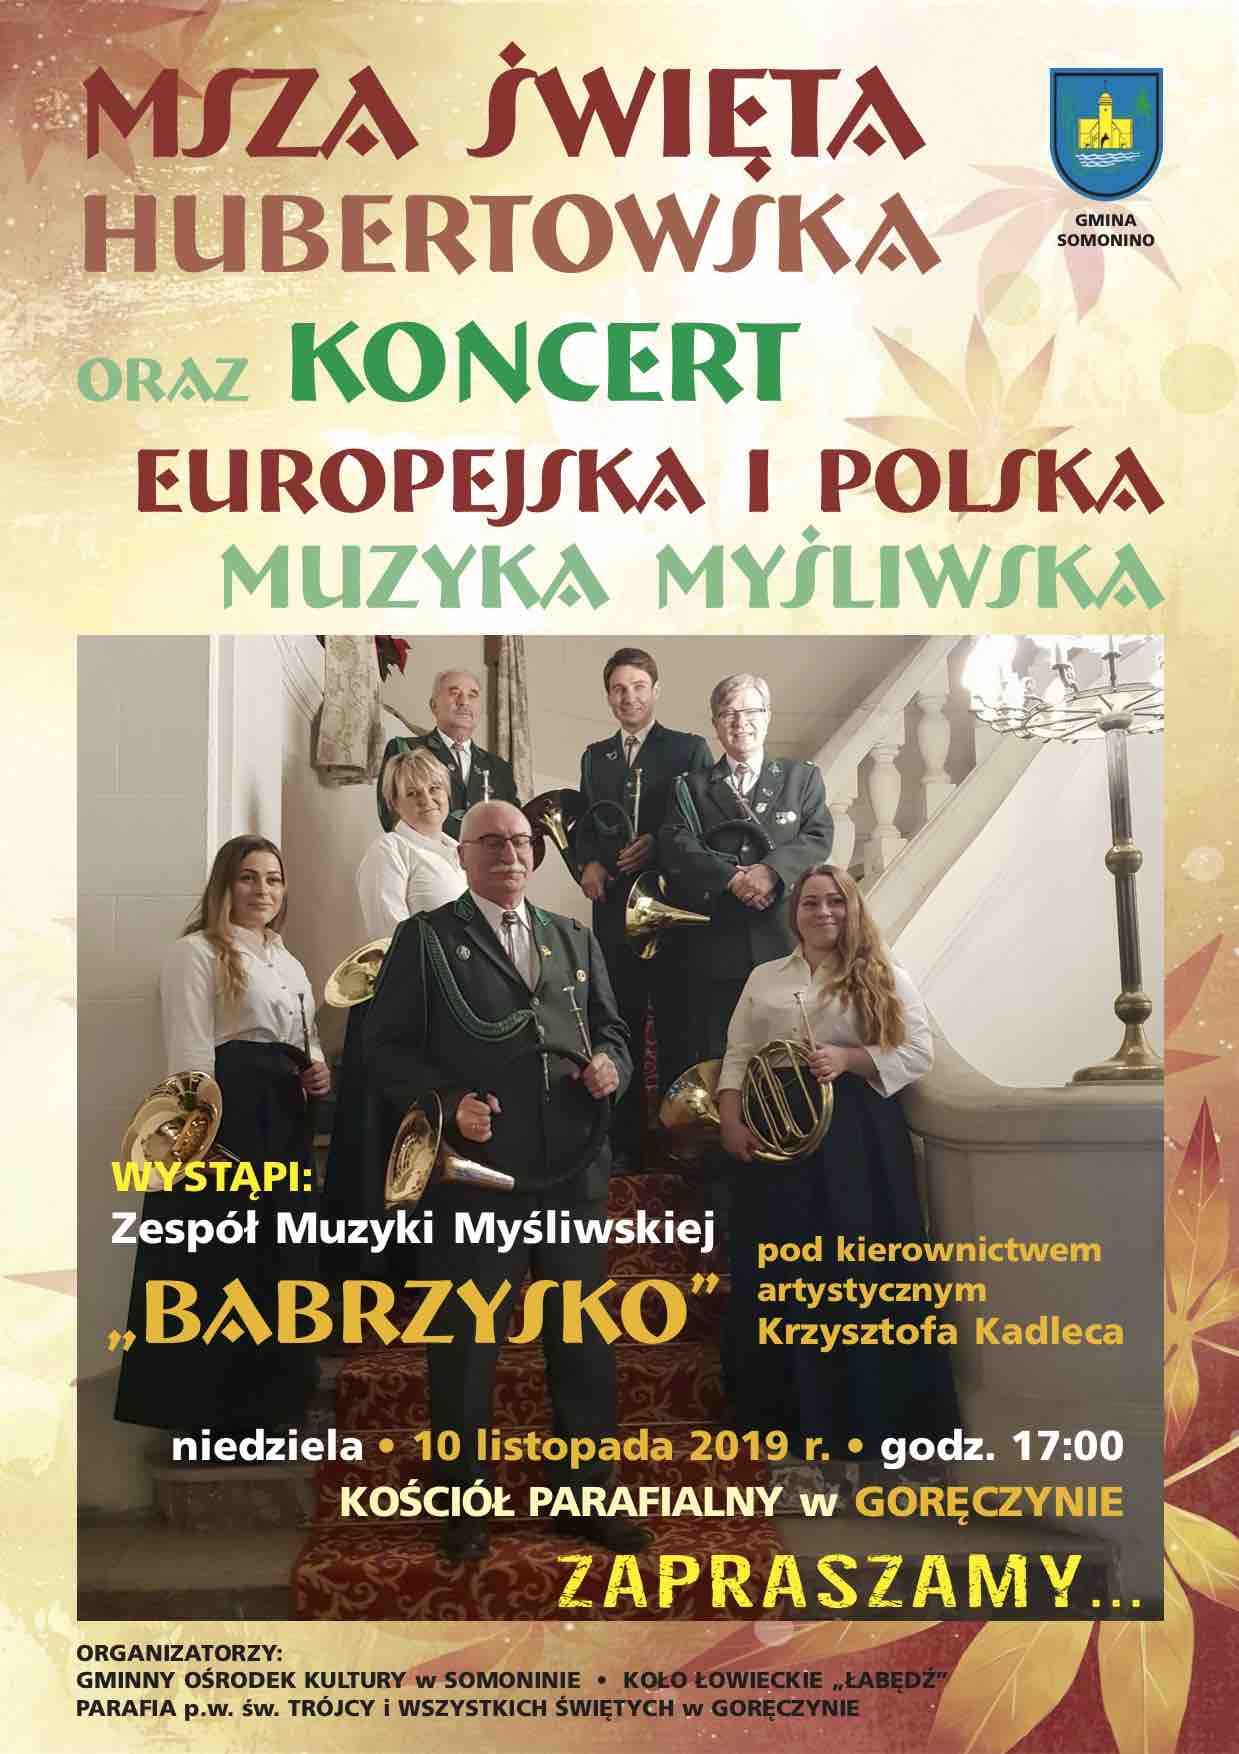 Msza Święta Hubertowska i koncert - Gmina Somonino